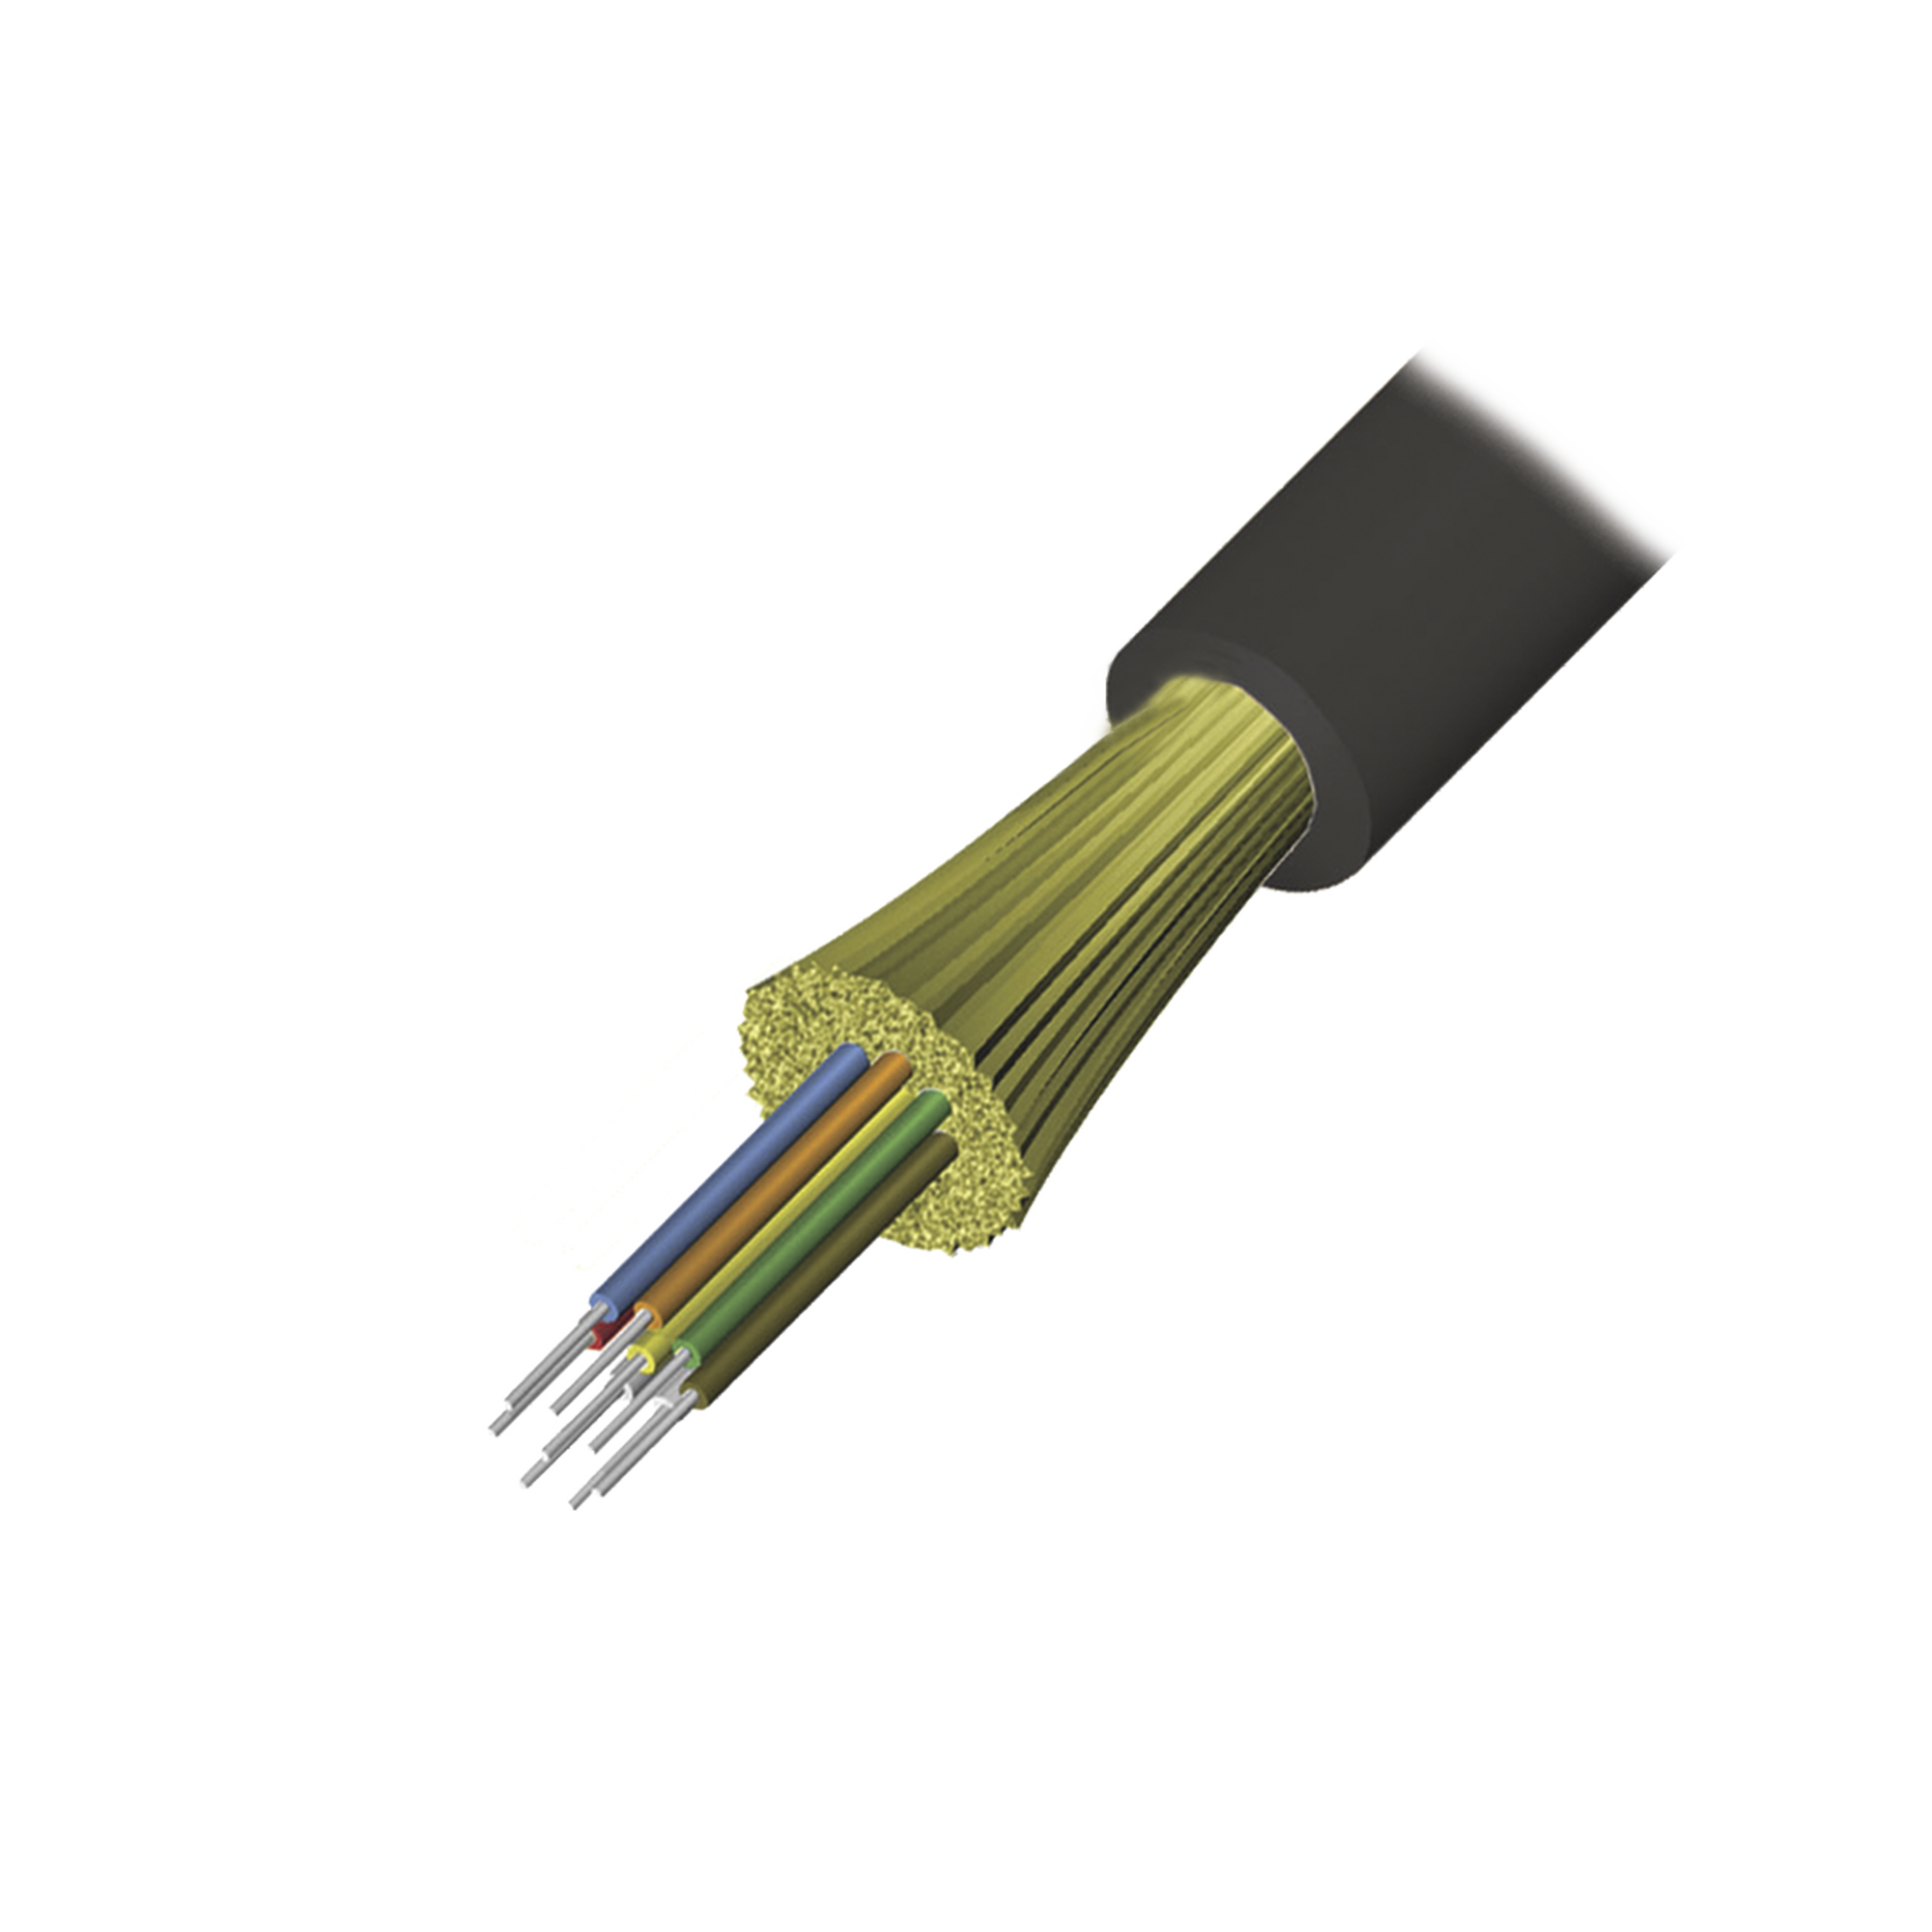 Cable de Fibra óptica de 6 hilos, Interior/Exterior, Tight Buffer, No Conductiva (Dieléctrica), LS0H, Multimodo OM3 50/125 optimizada, 1 Metro